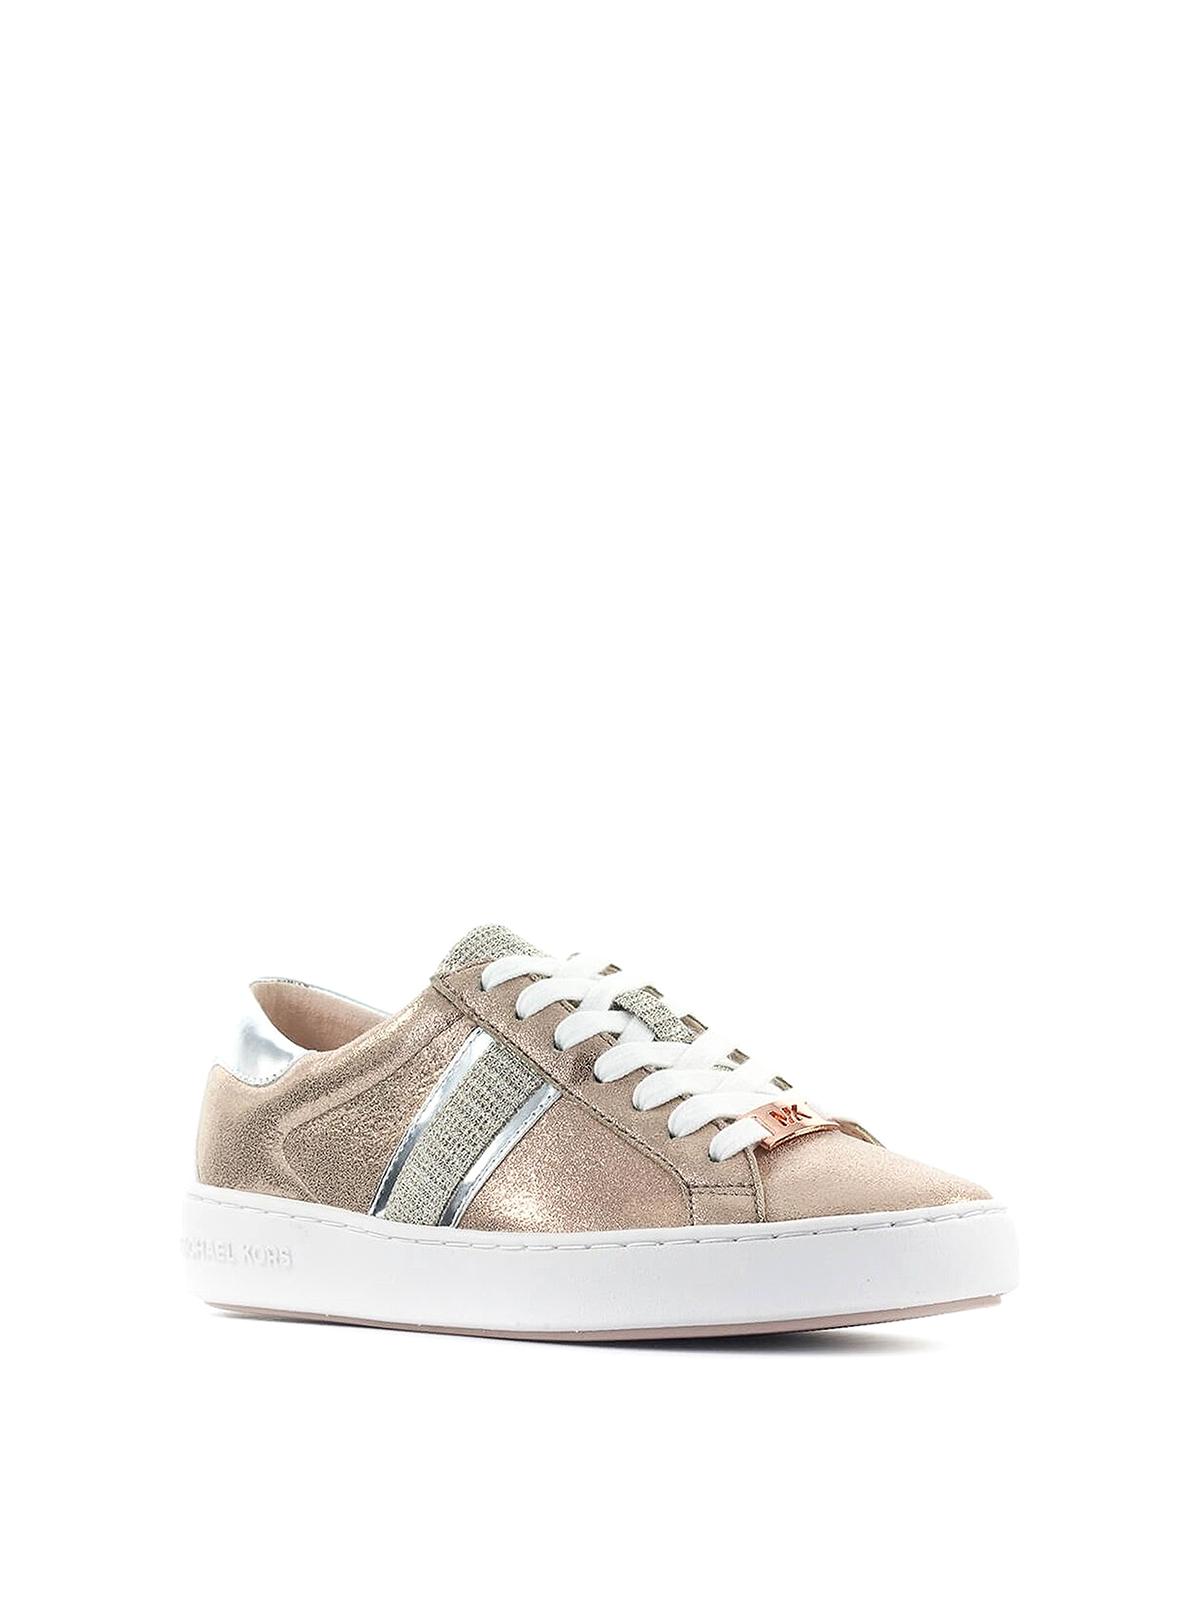 michael kors keaton stripe sneaker